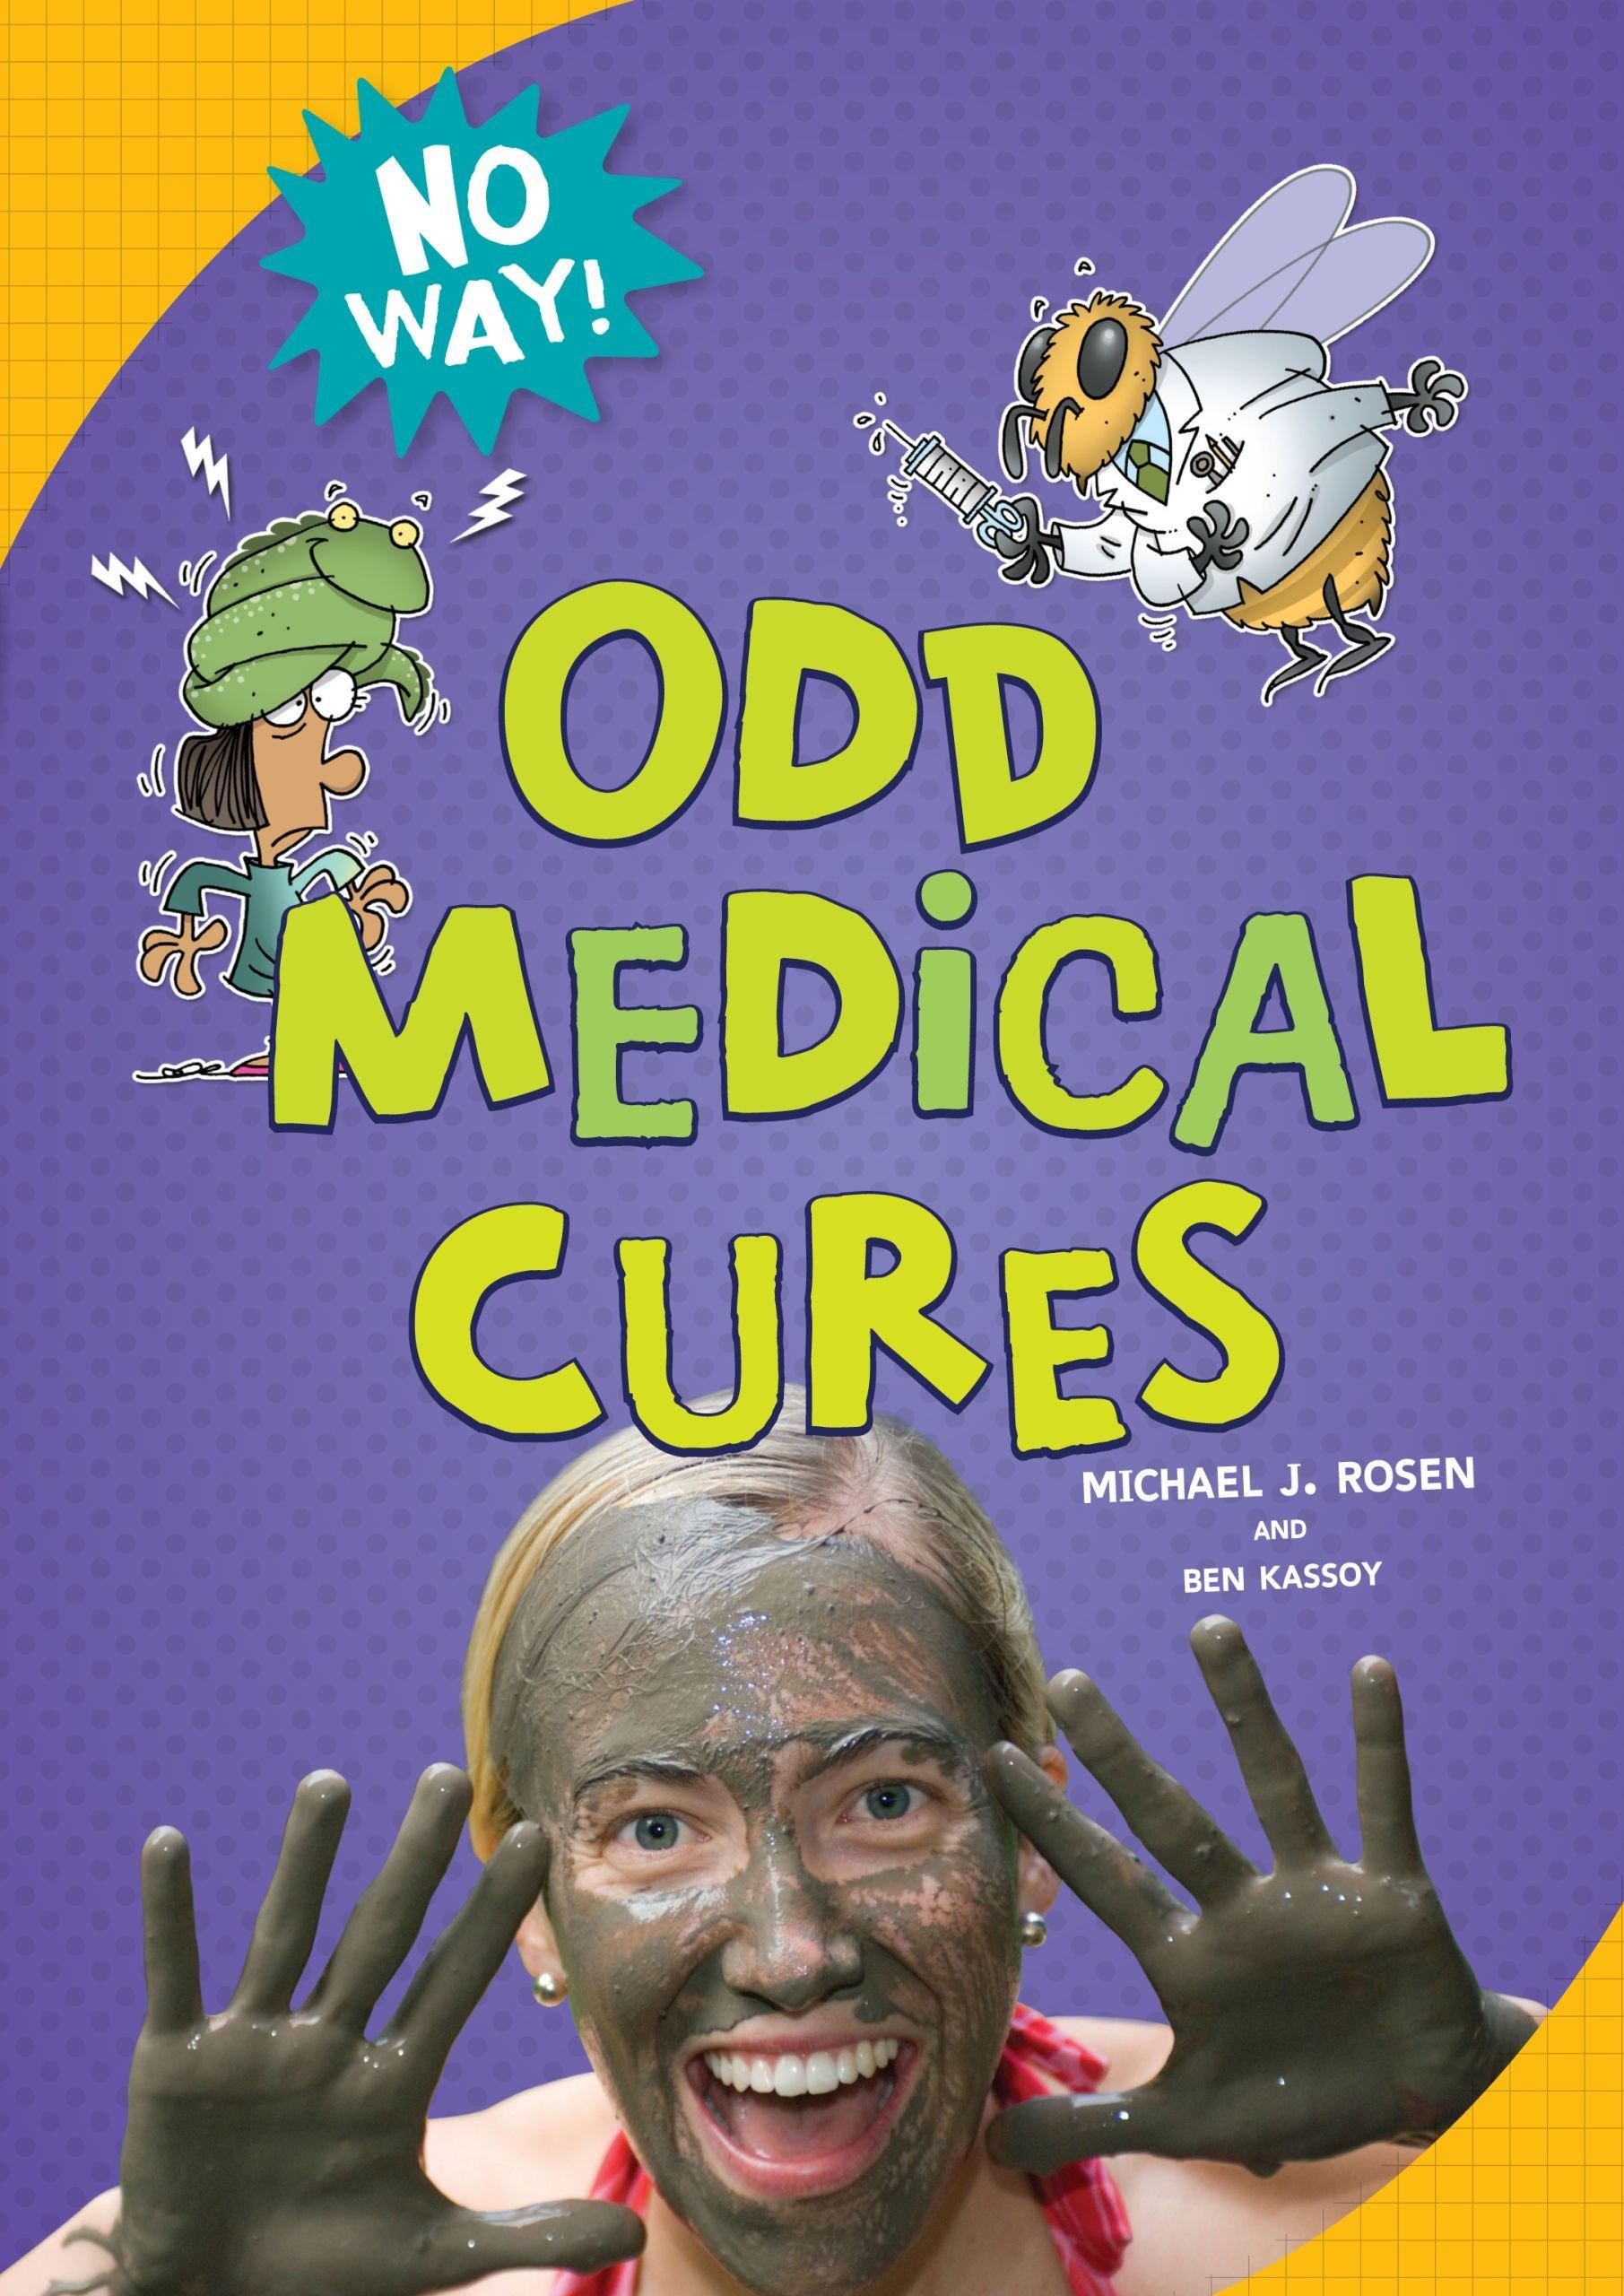 Odd Medical Cures (No Way!)